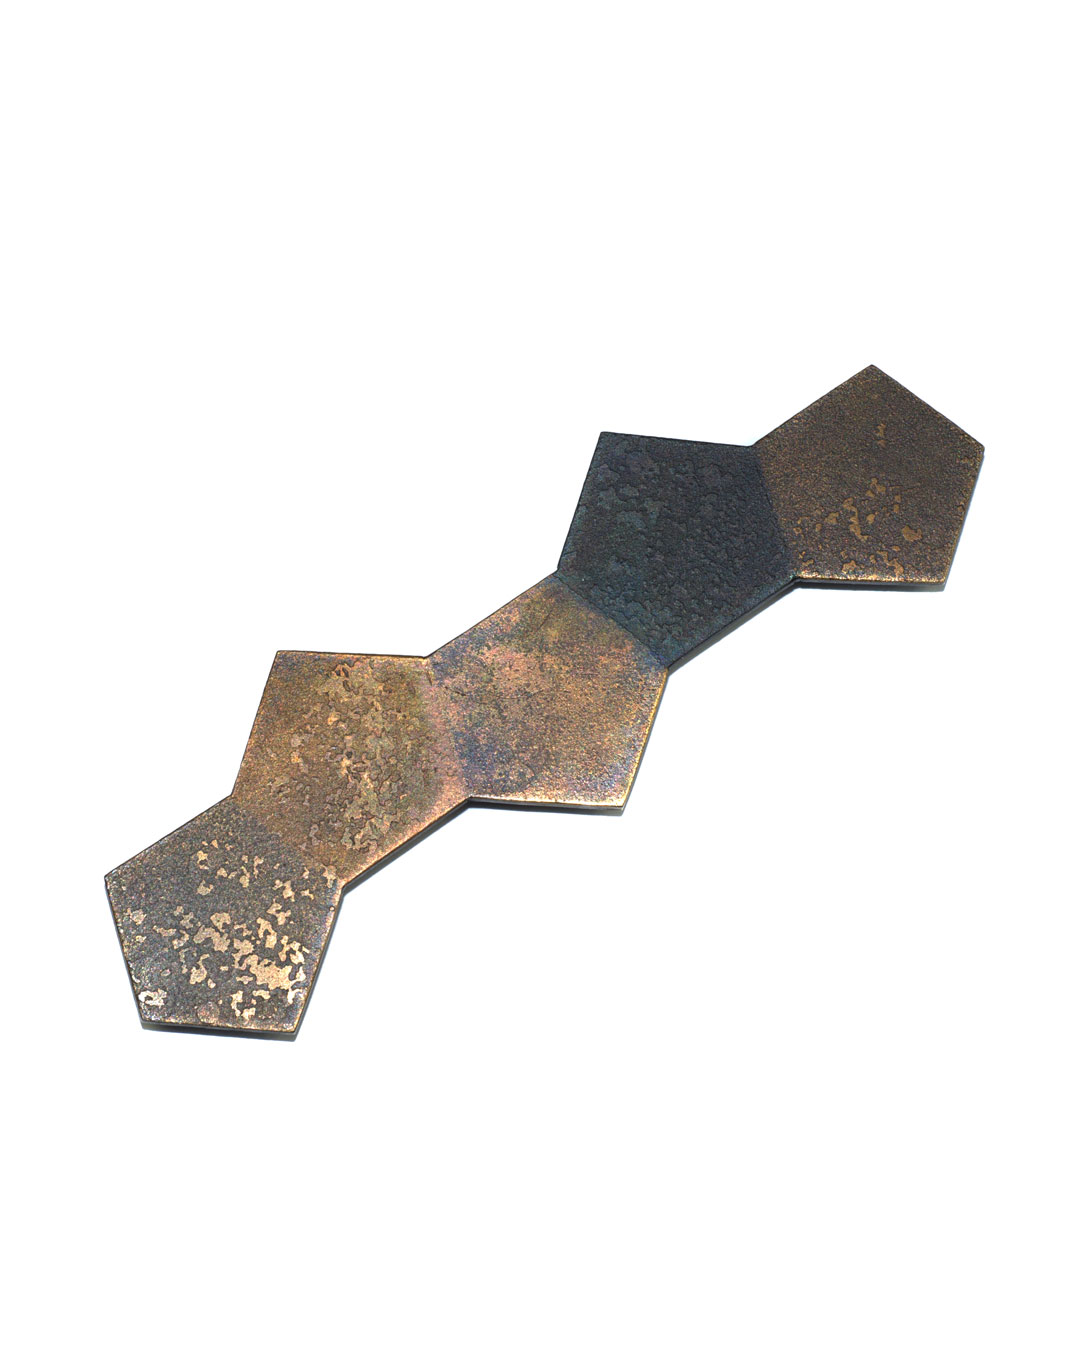 Tore Svensson, Pentagon, 2008, brooch; etched steel, partly gilt, 100 x 35 x 1.5 mm, €425